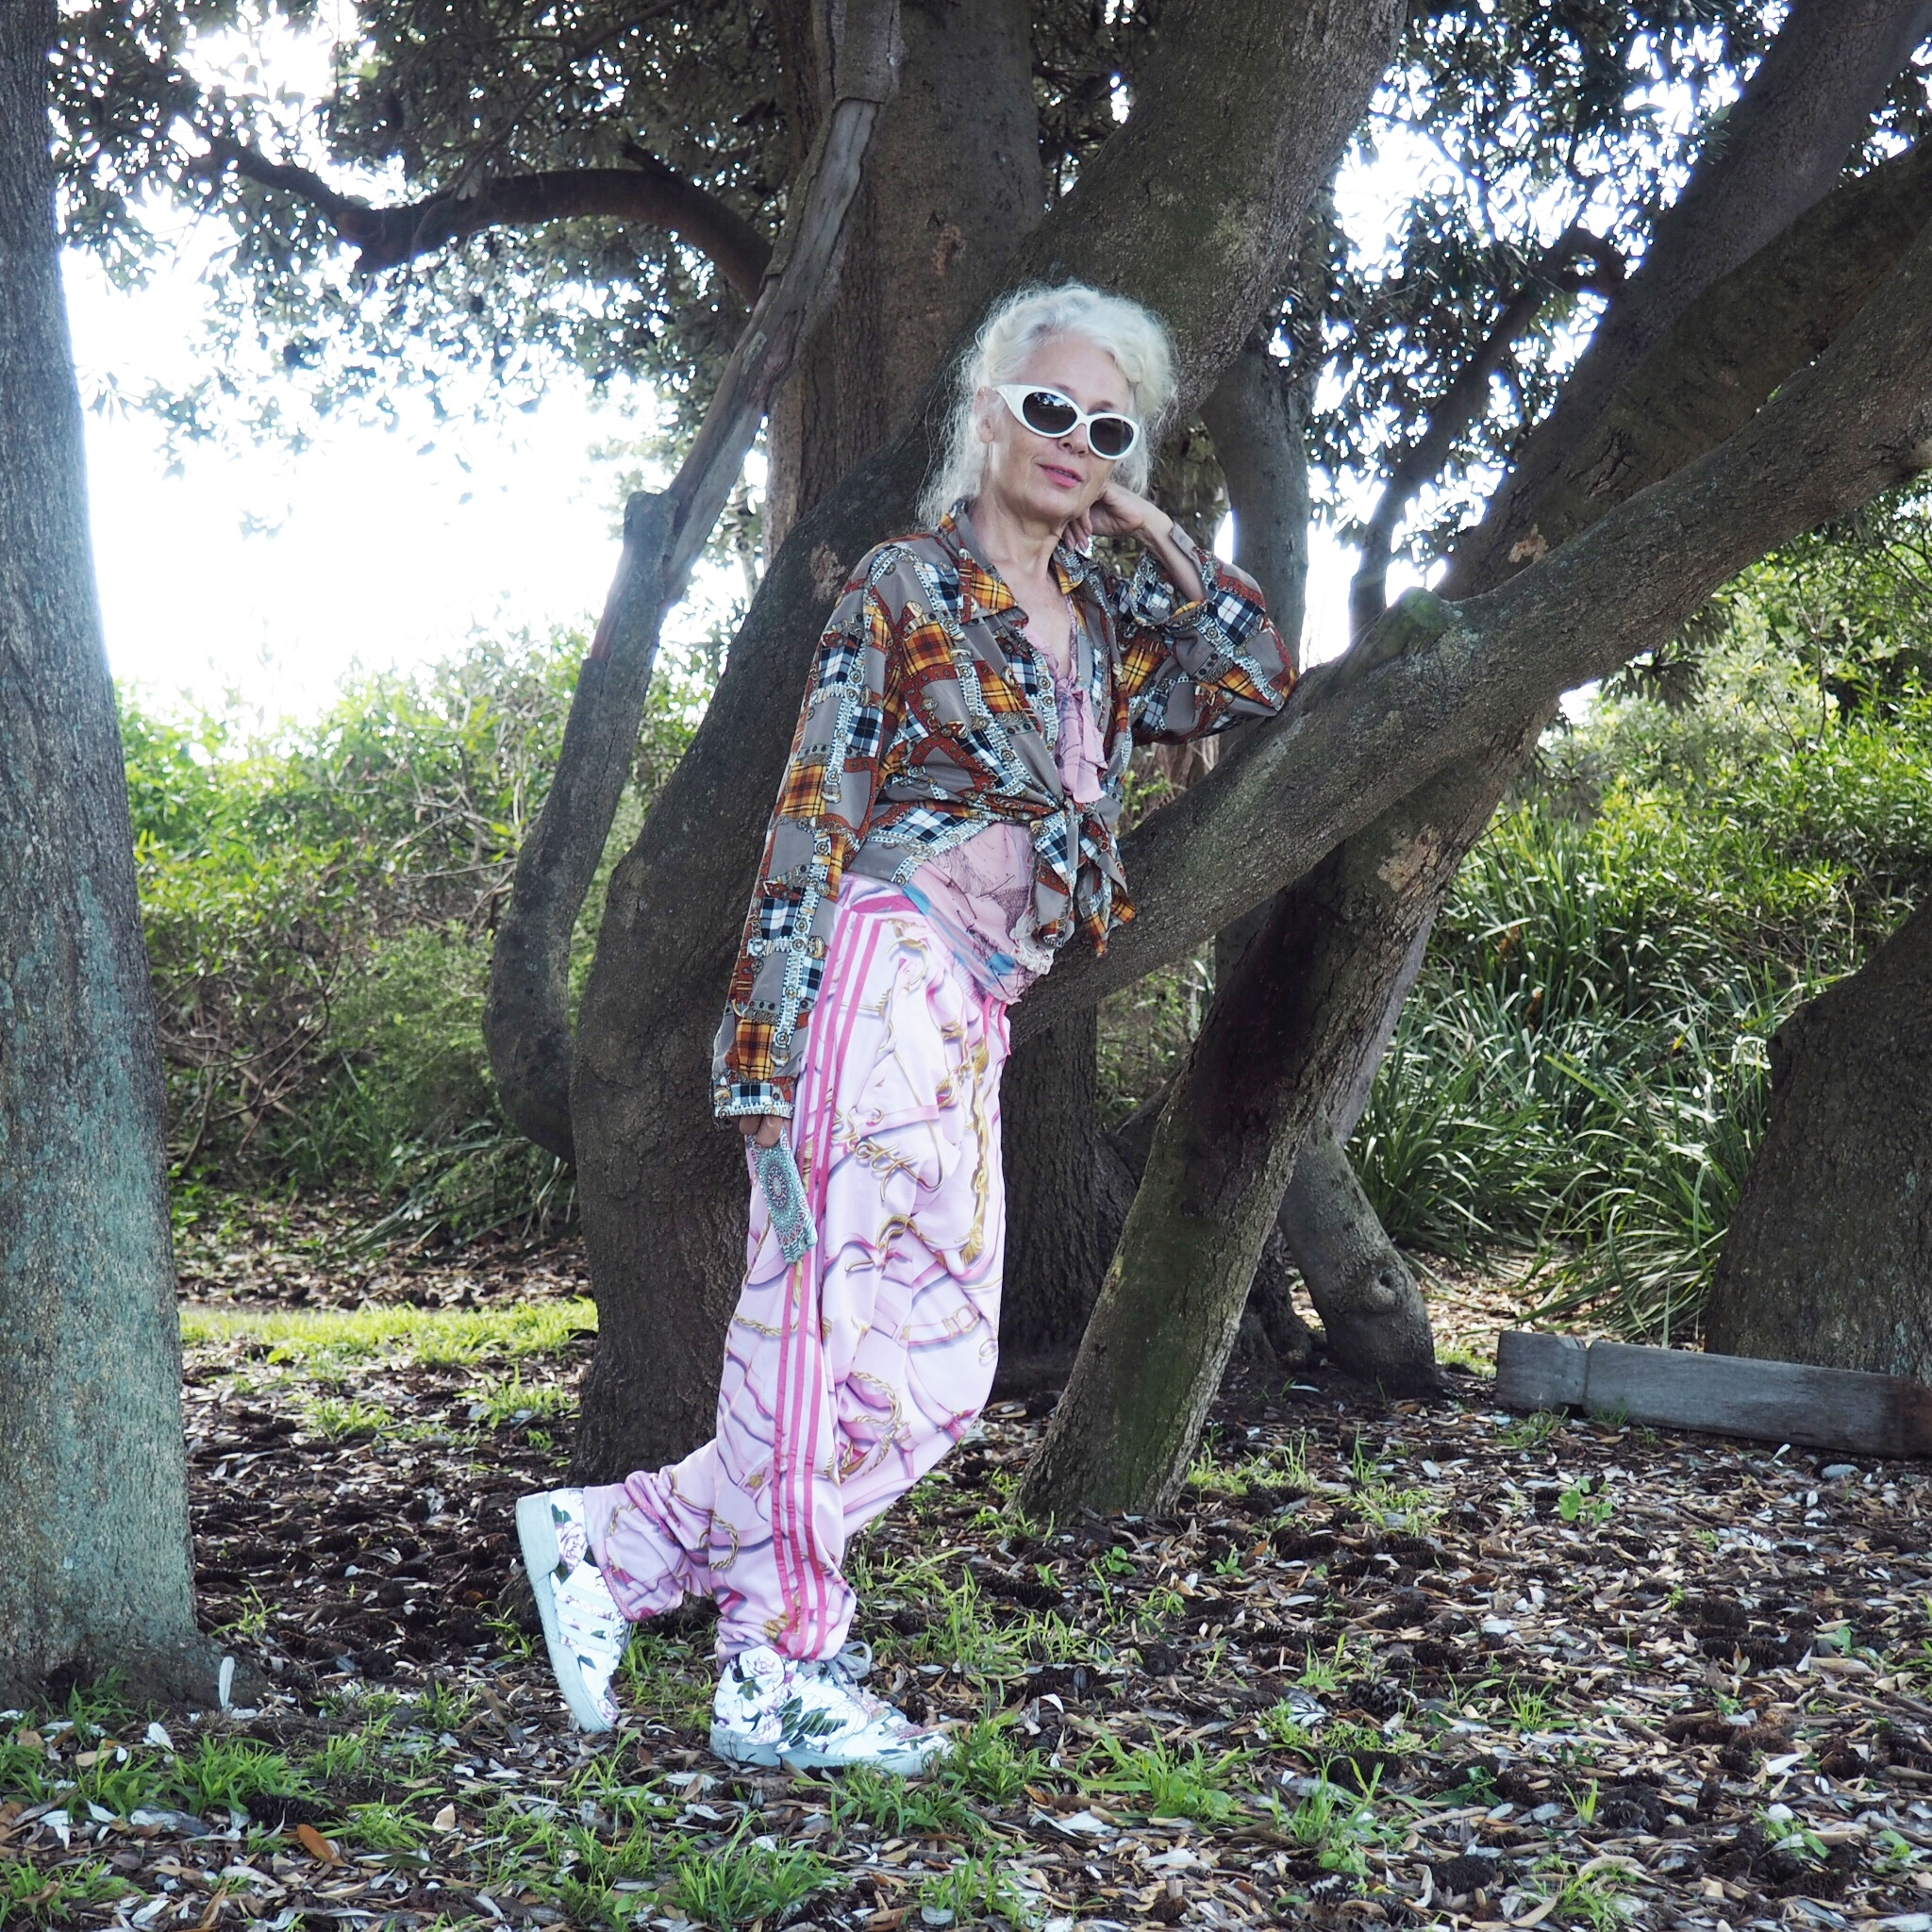 My stylish friend Sarah Jane Adams. Known on Instagram as  @saramaijewels.  In Coogee, Australia.